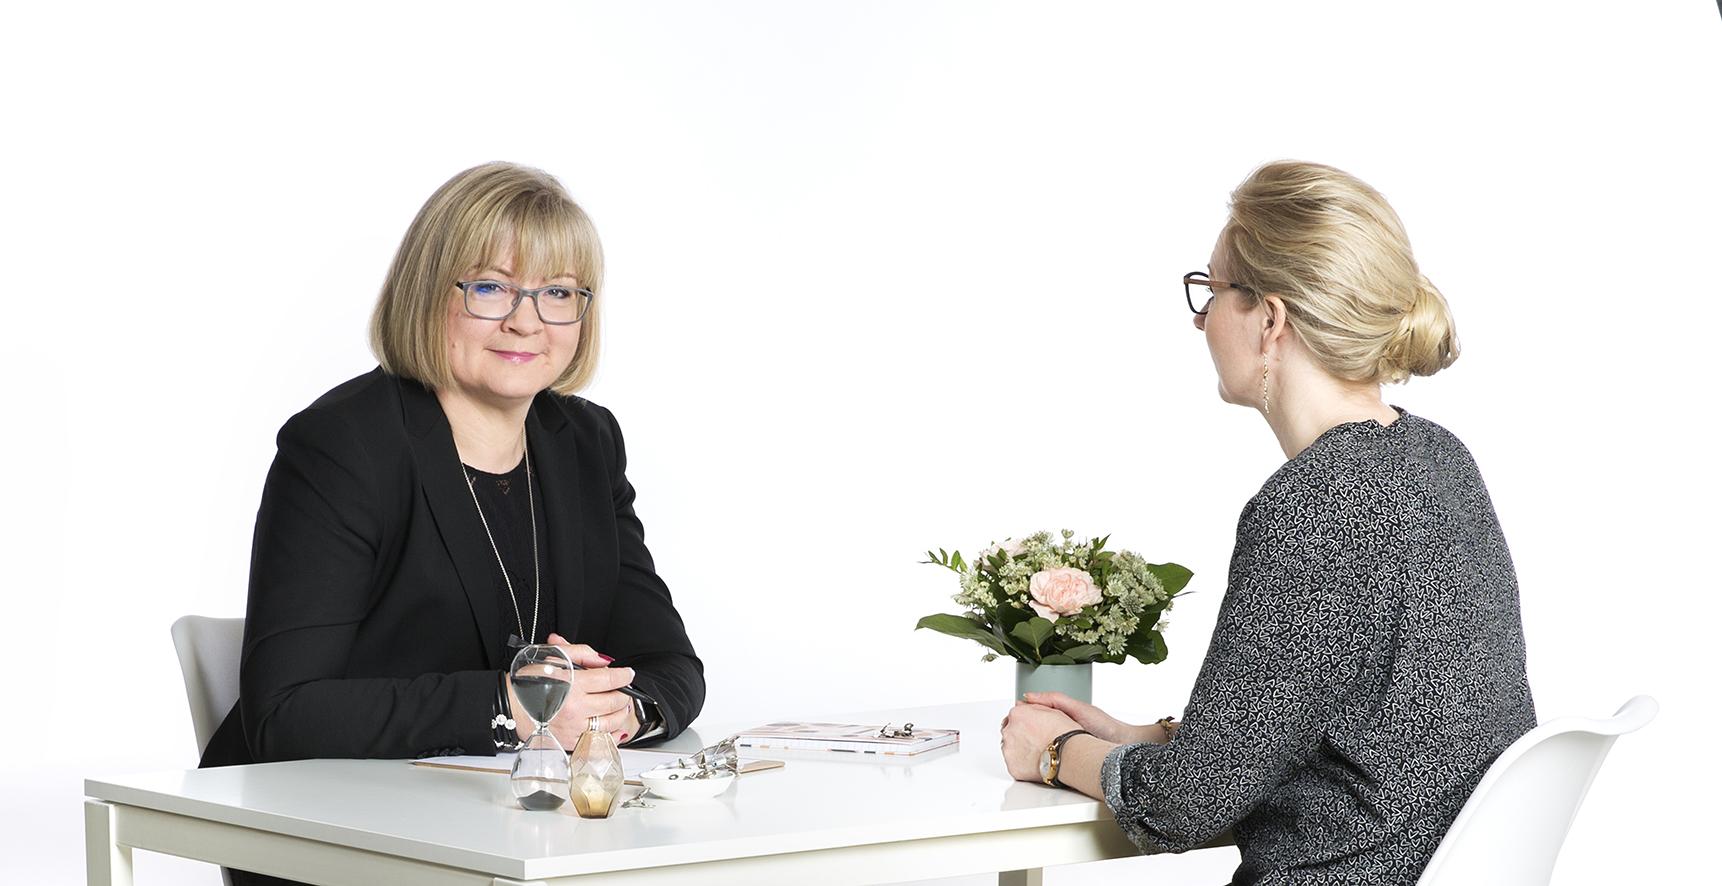 Erhvervscoach Birgitte Feldborg